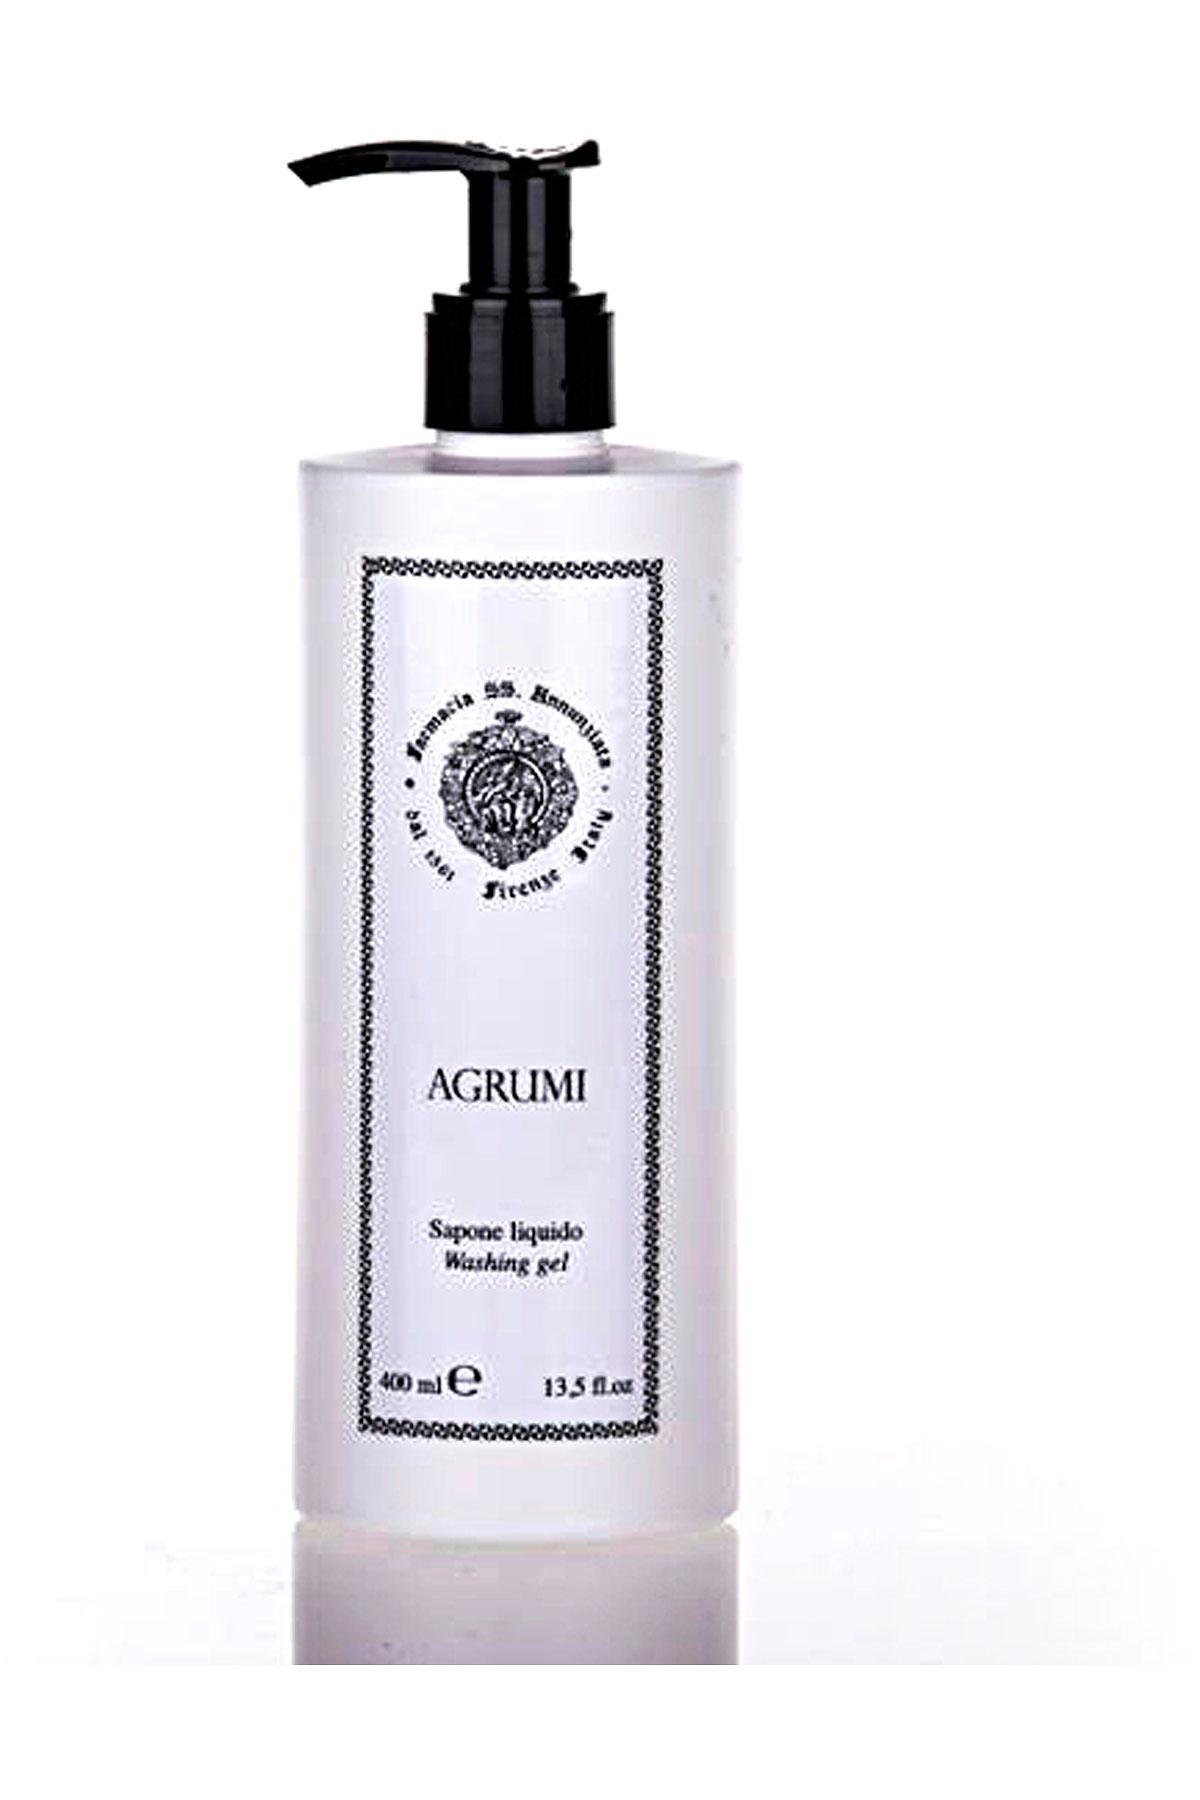 Farmacia Ss Annunziata 1561 Beauty for Men On Sale, Agrumi - Liquid Soap - 400 Ml, 2019, 400 ml